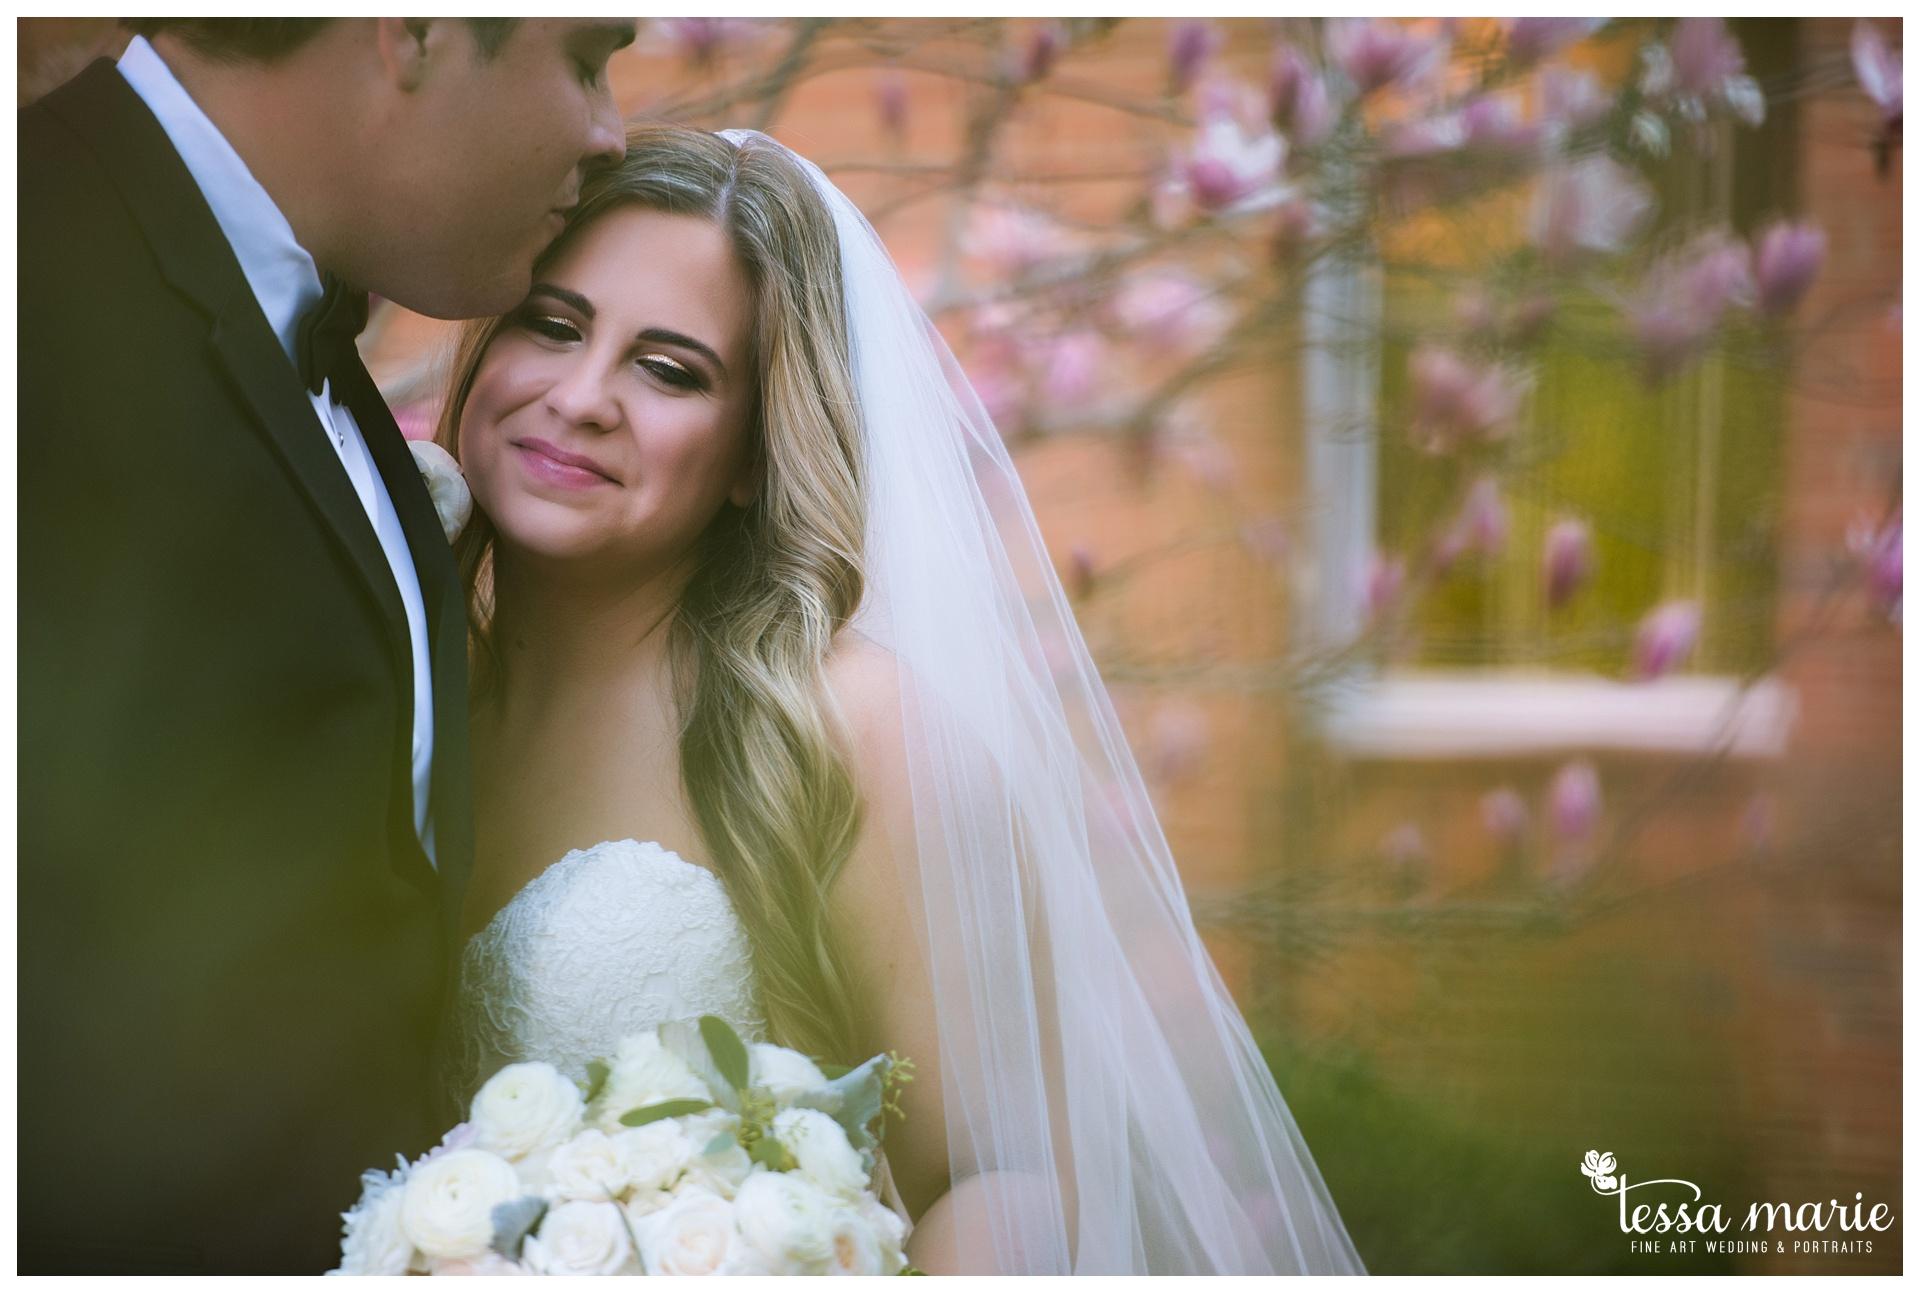 tessa_marie_weddings_legacy_story_focused_wedding_pictures_atlanta_wedding_photographer_0121